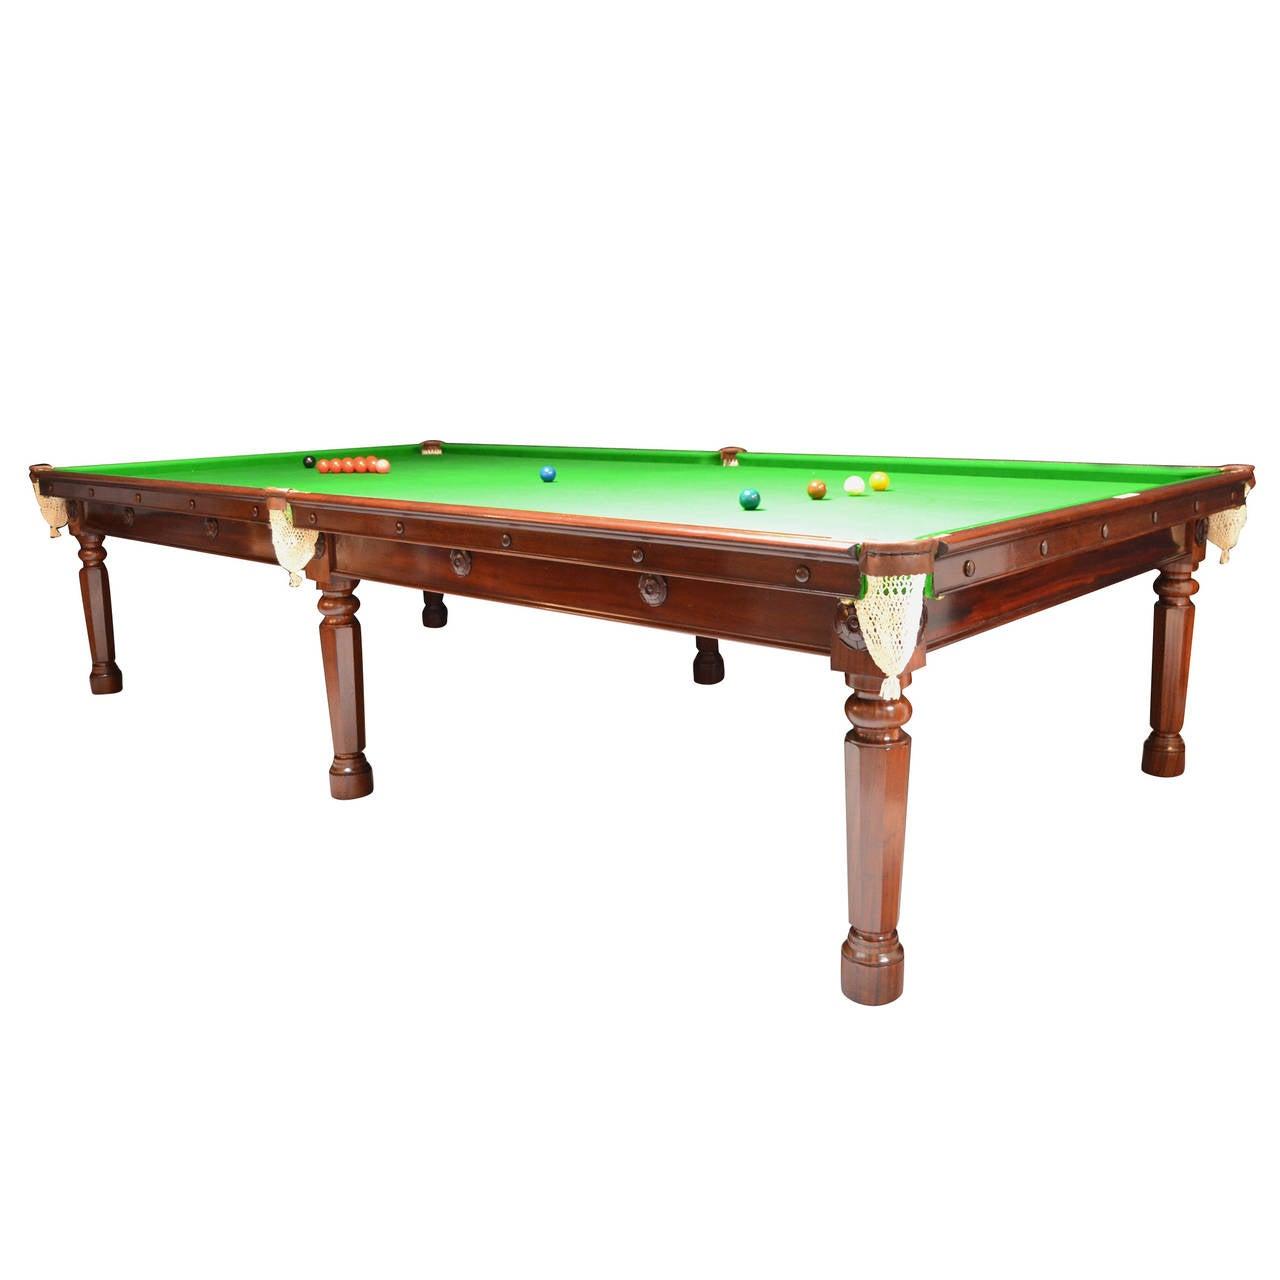 Gillows Billiard Snooker Pool Table Circa 1810 For Sale